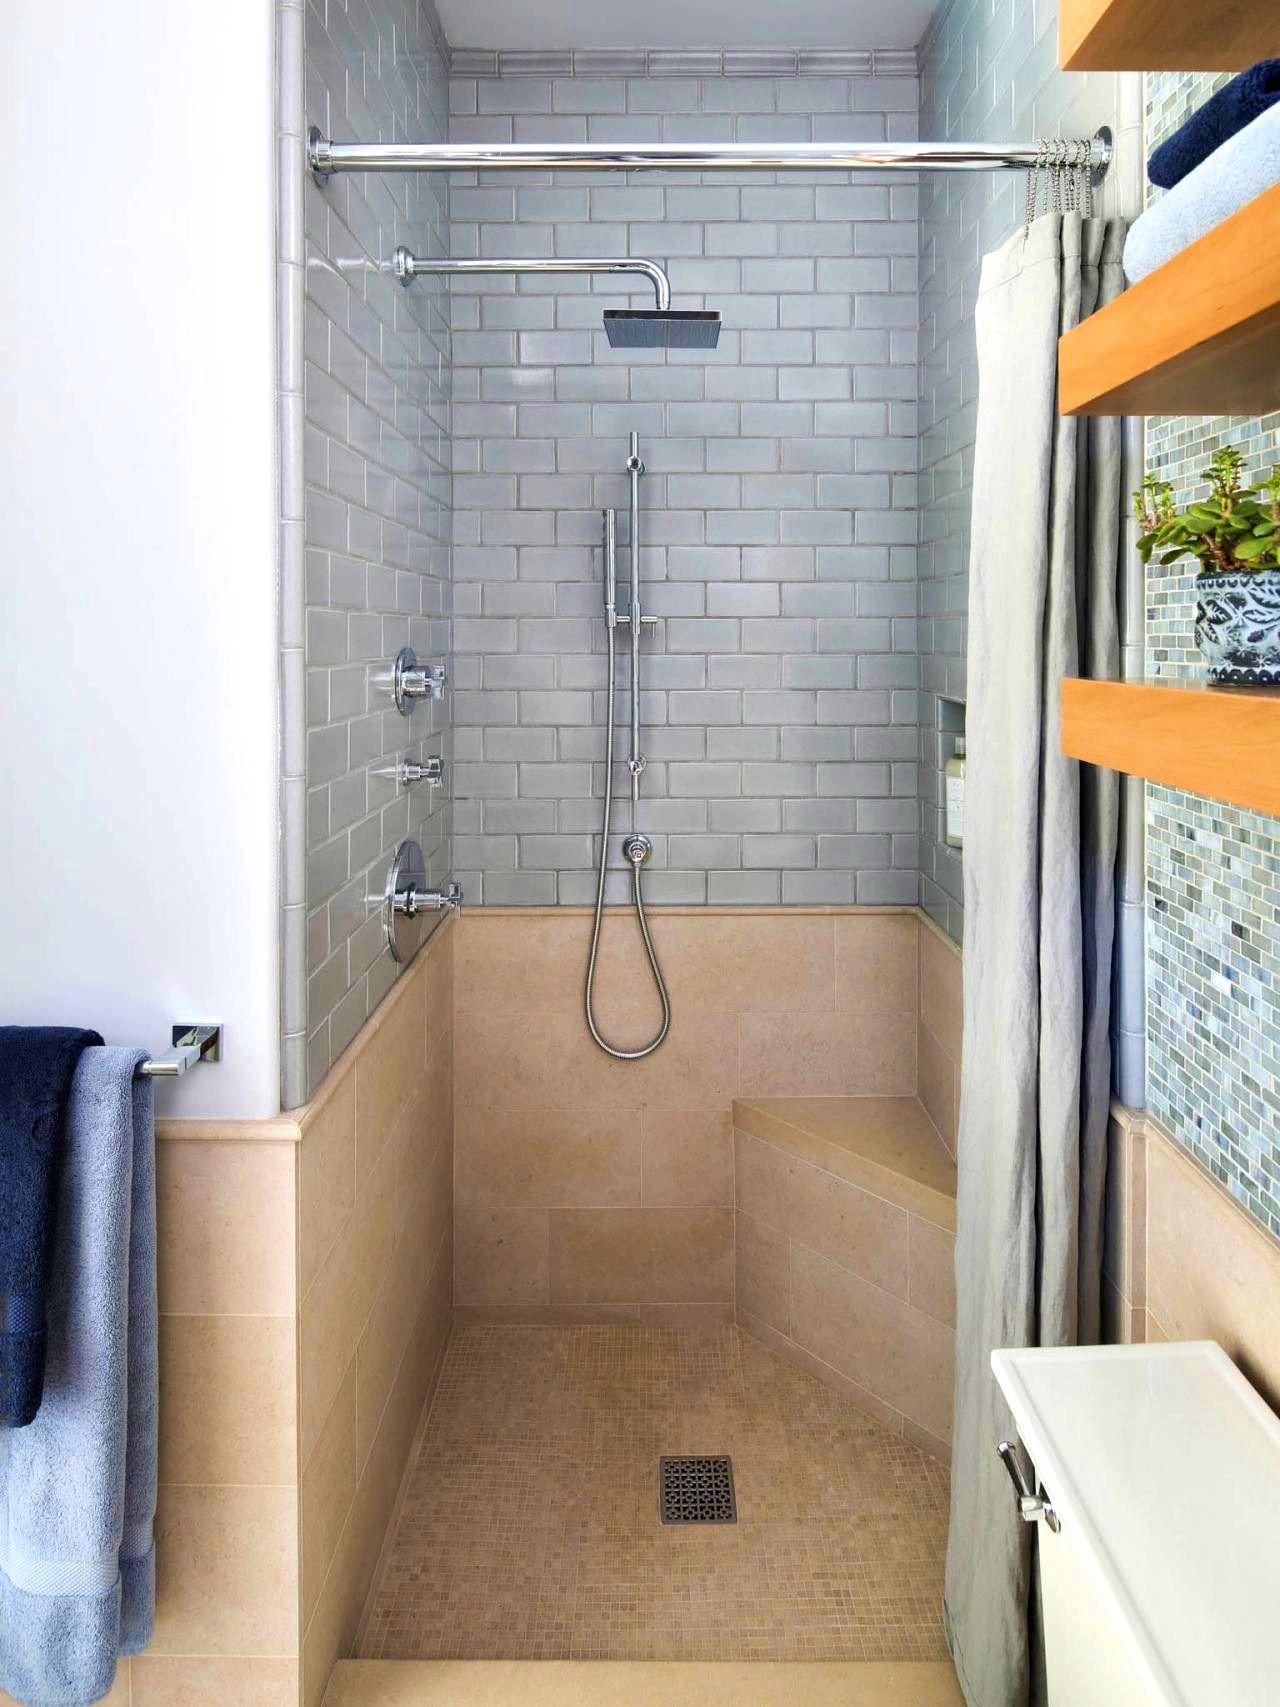 Best Of Large White Subway Tile Bathroom